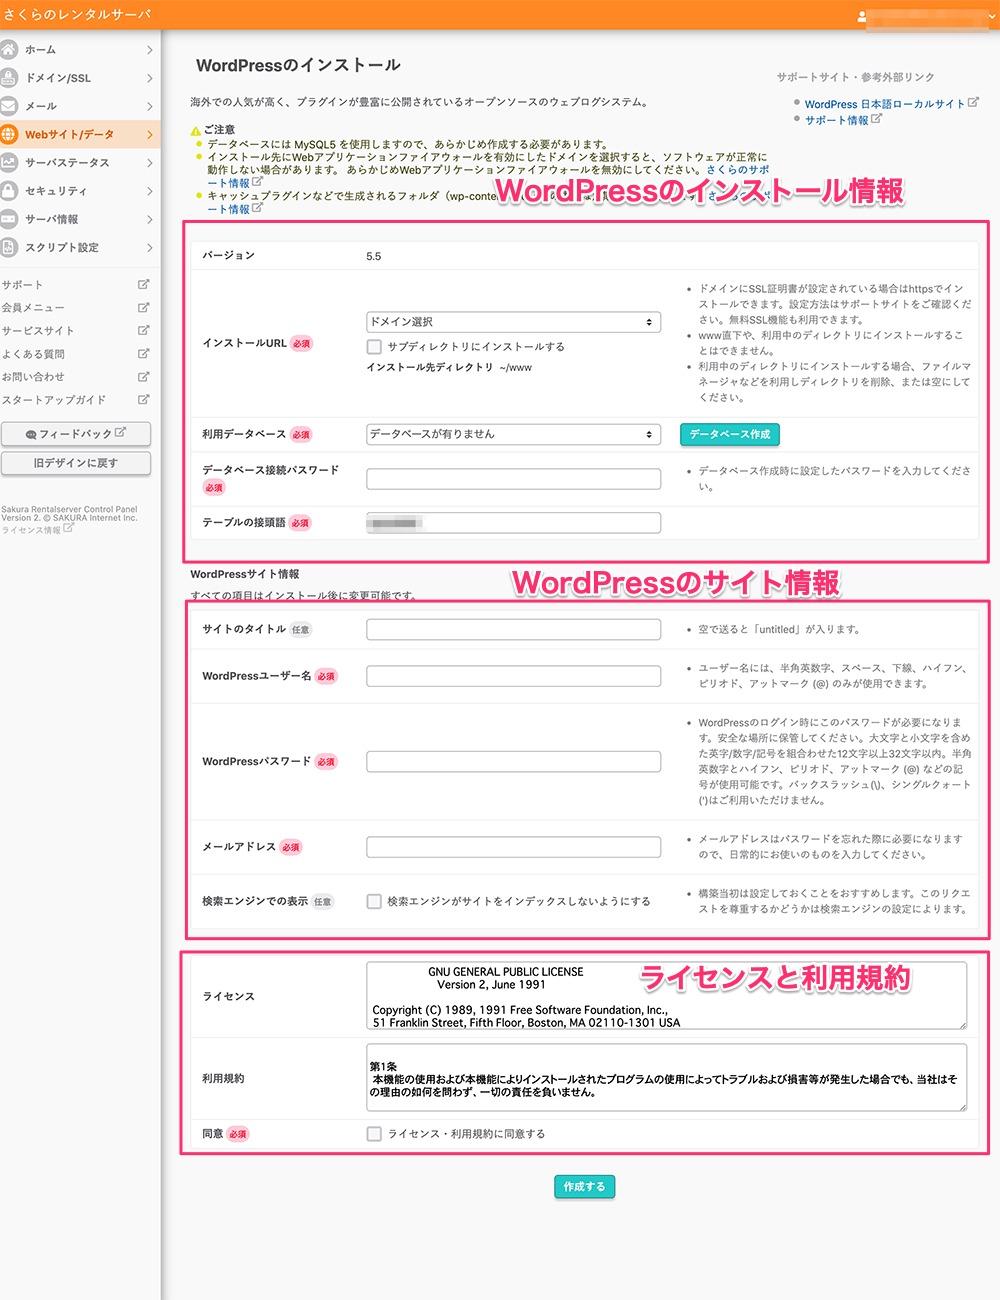 WordPressのインストール情報入力画面